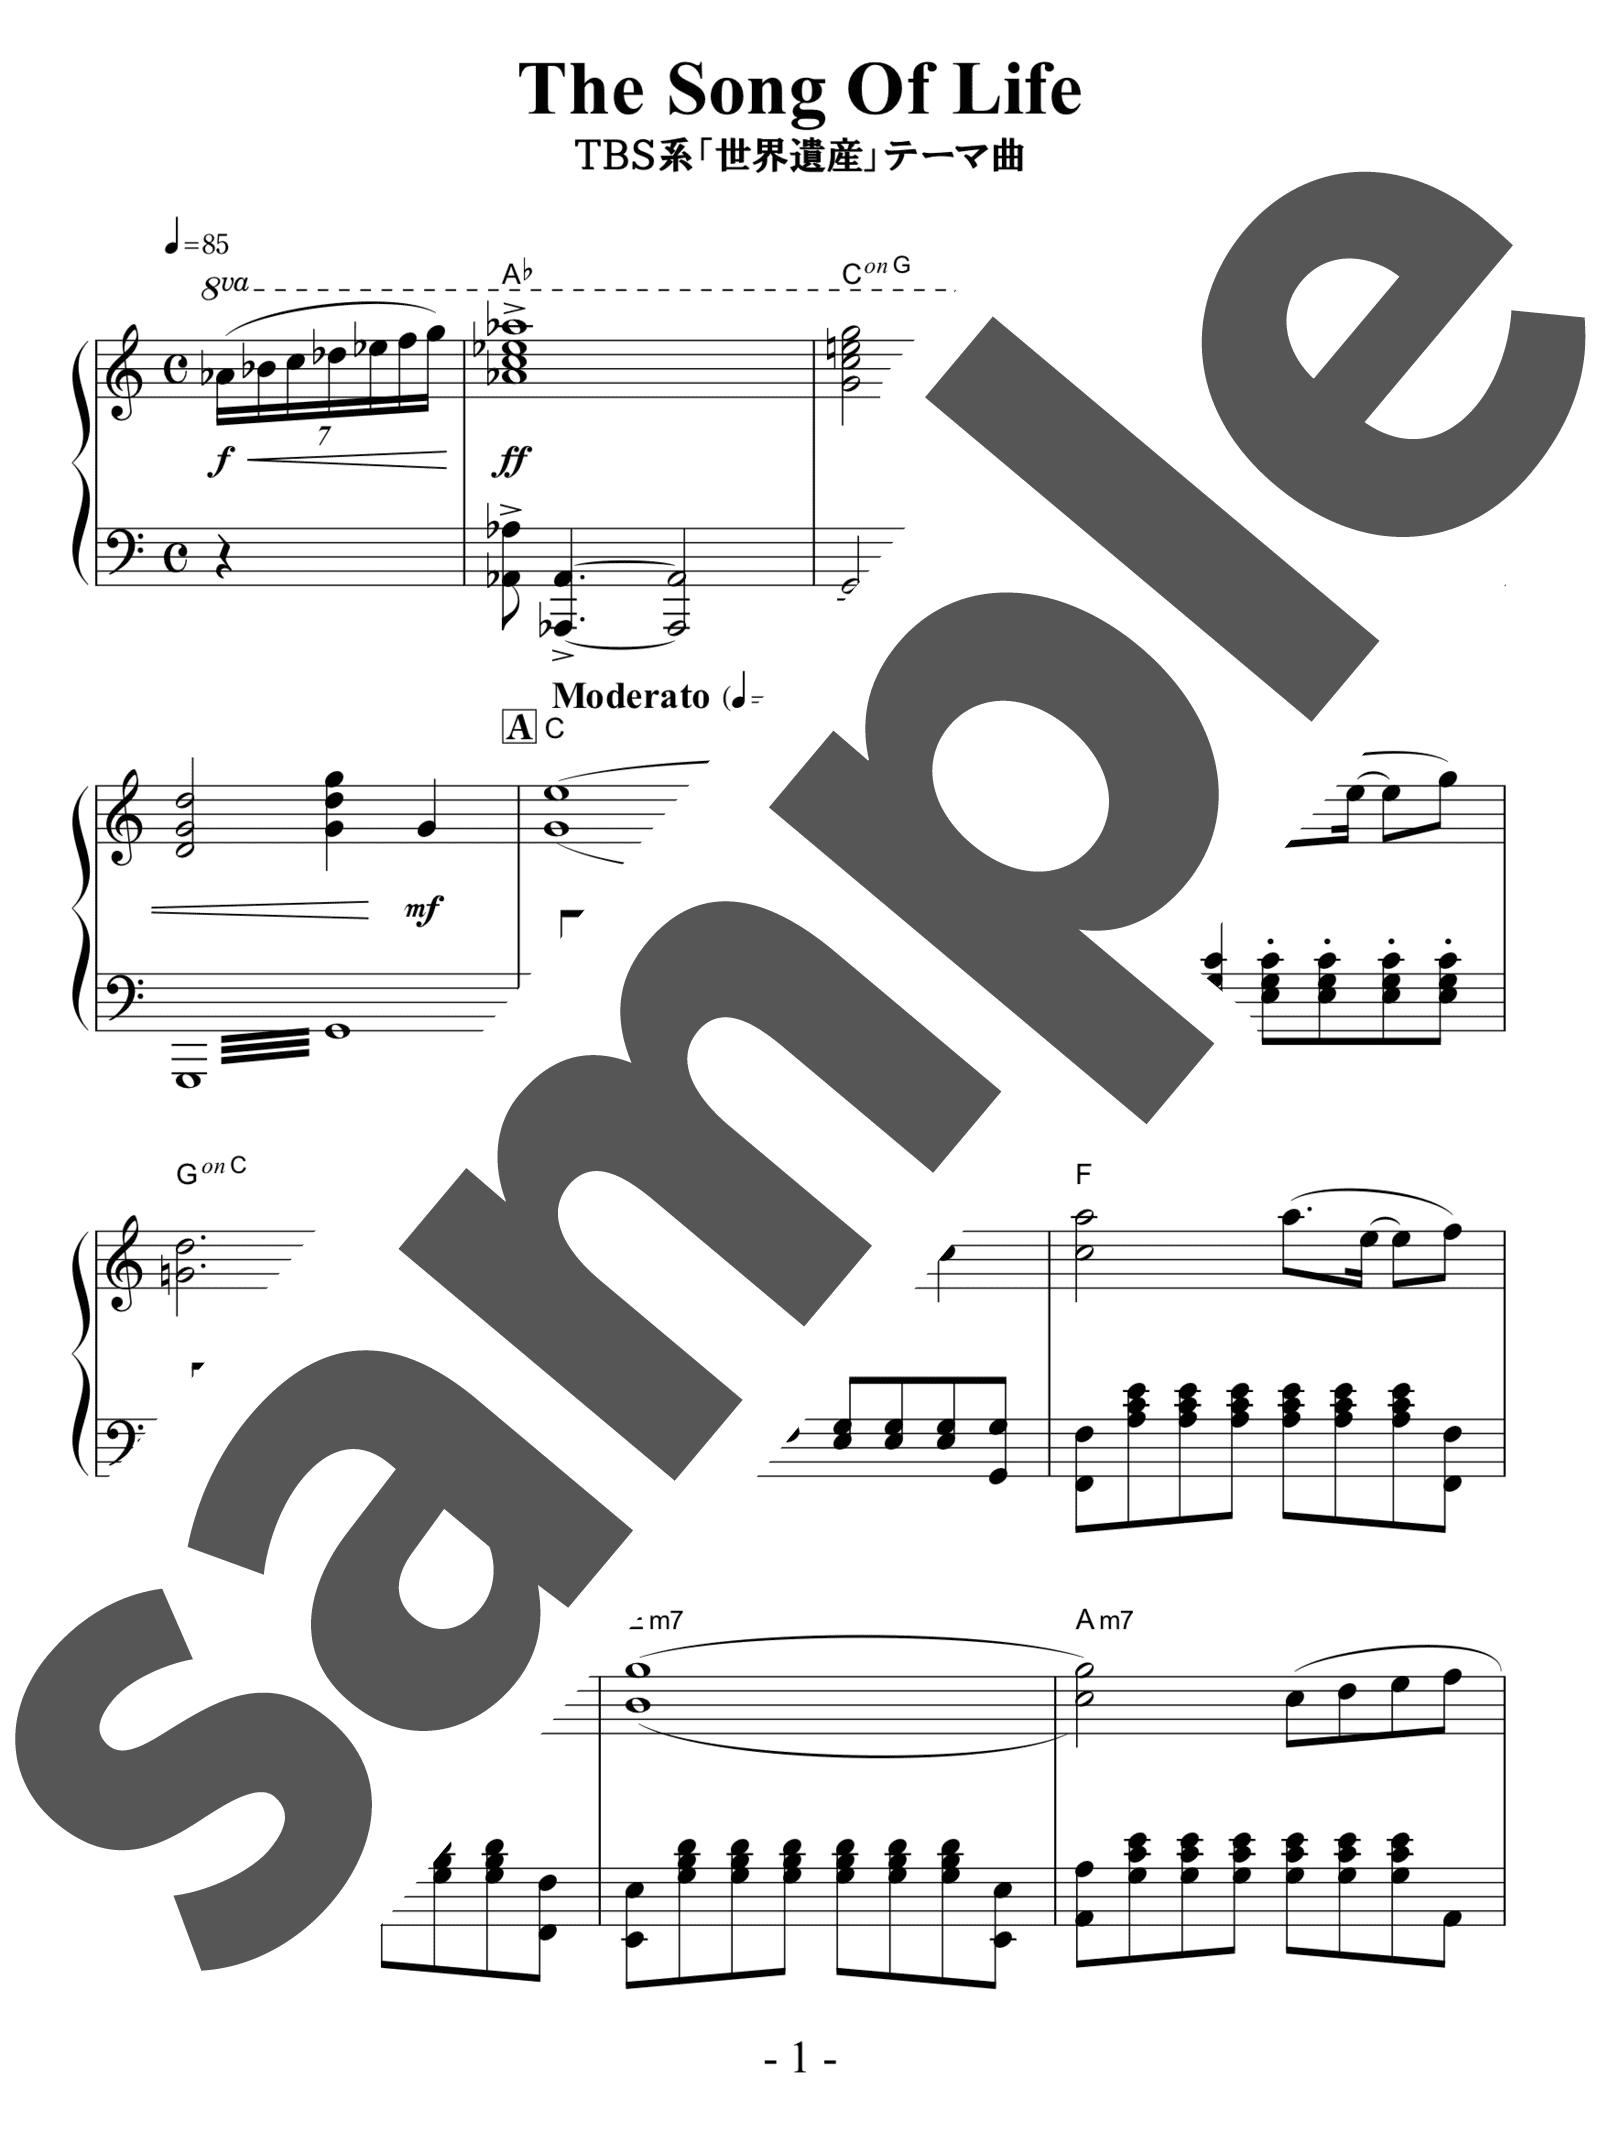 「The Song of Life」のサンプル楽譜